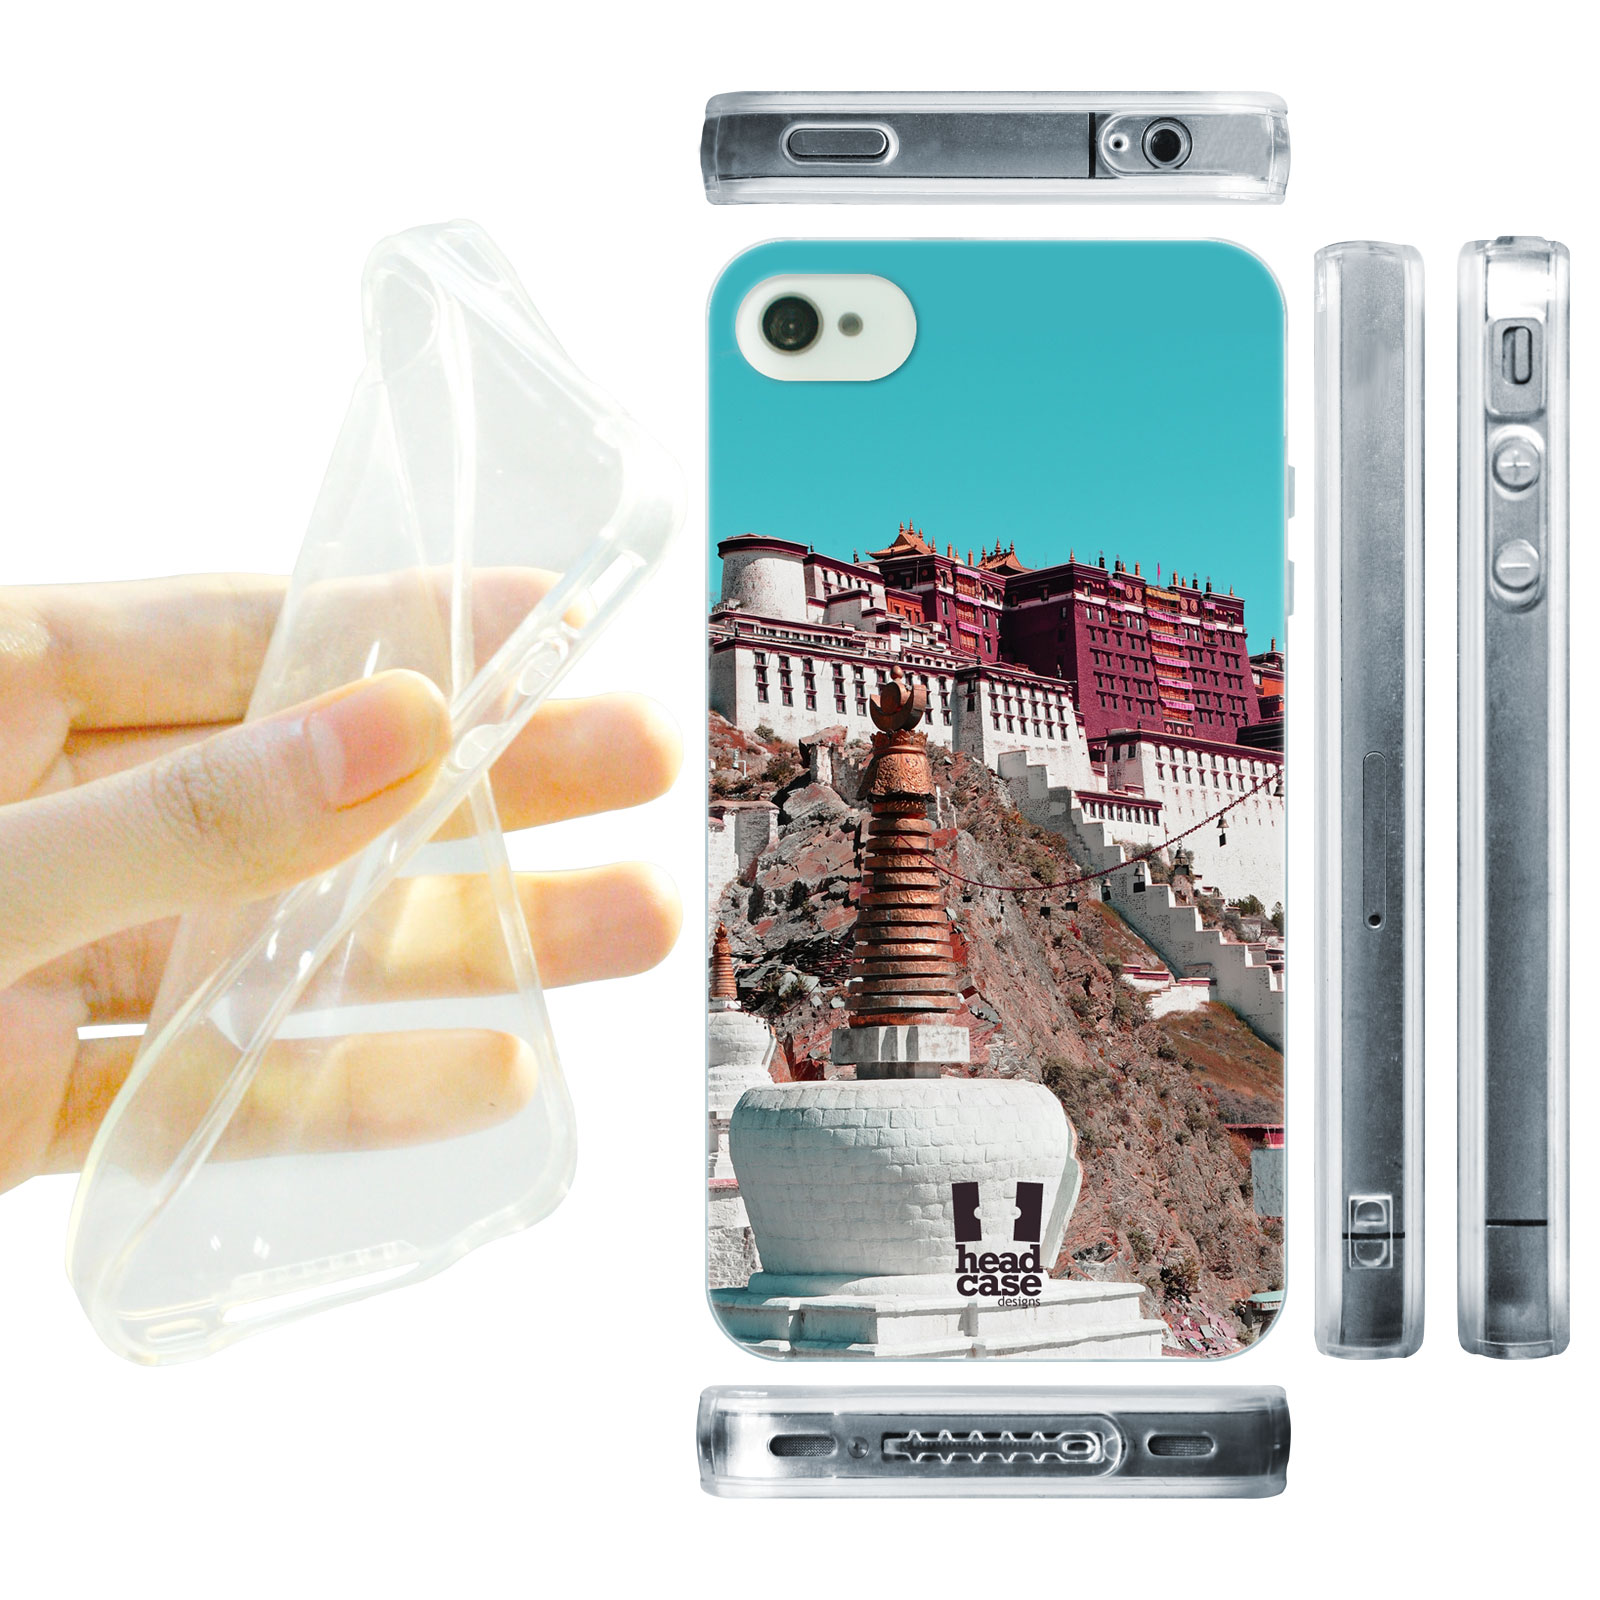 HEAD CASE silikonový obal na mobil Iphone 4/4S foto chrám Tibet